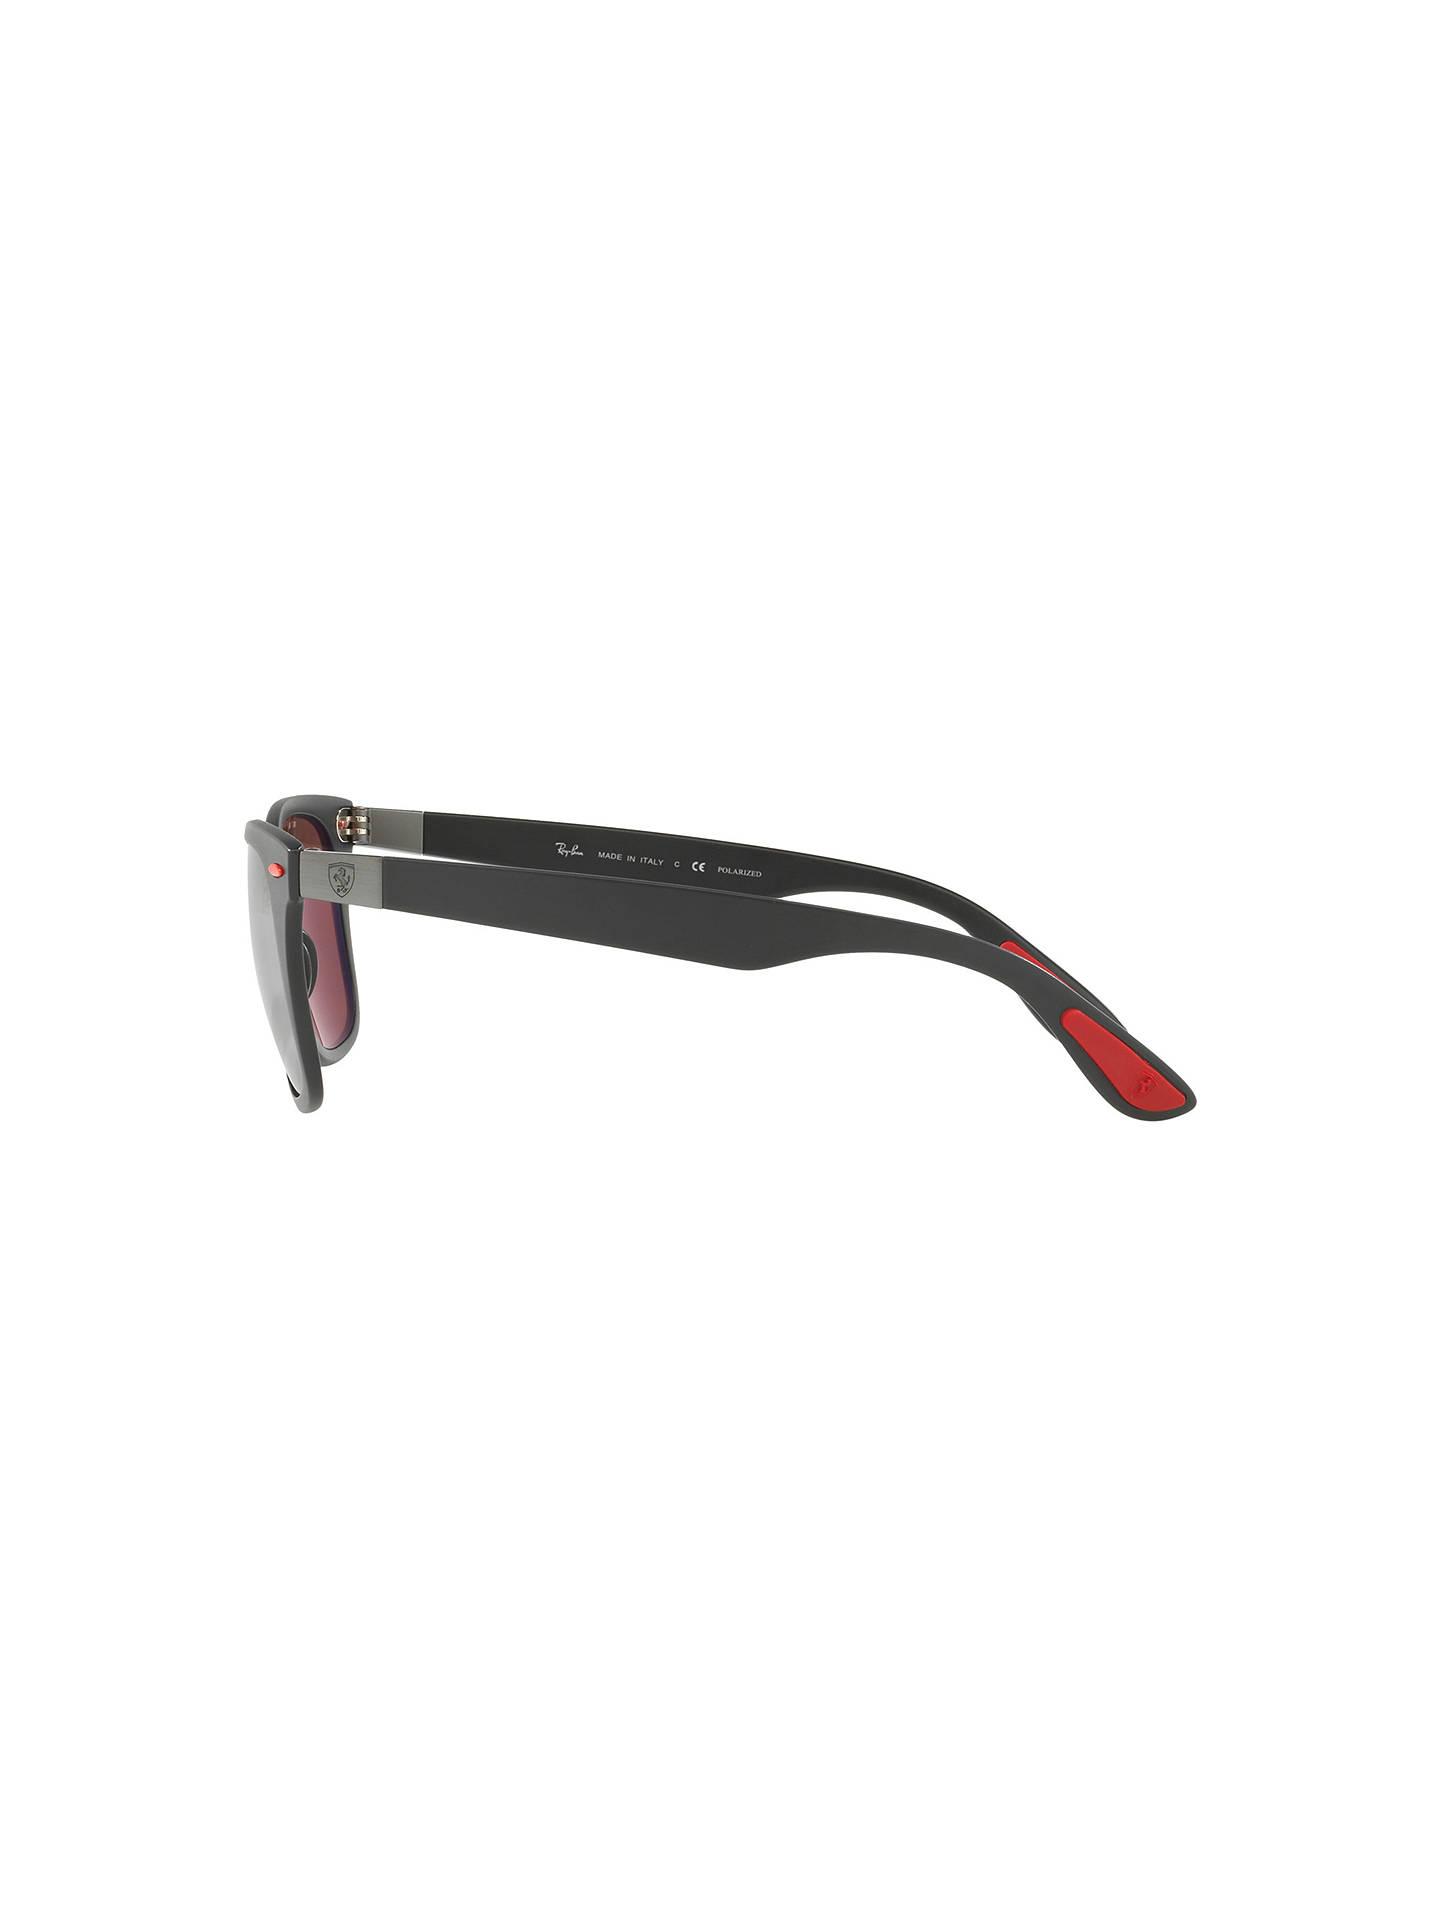 e6dcd91d0d41 ... Buy Ray-Ban RB4195M Polarised Scuderia Ferrari Wayfarer Sunglasses